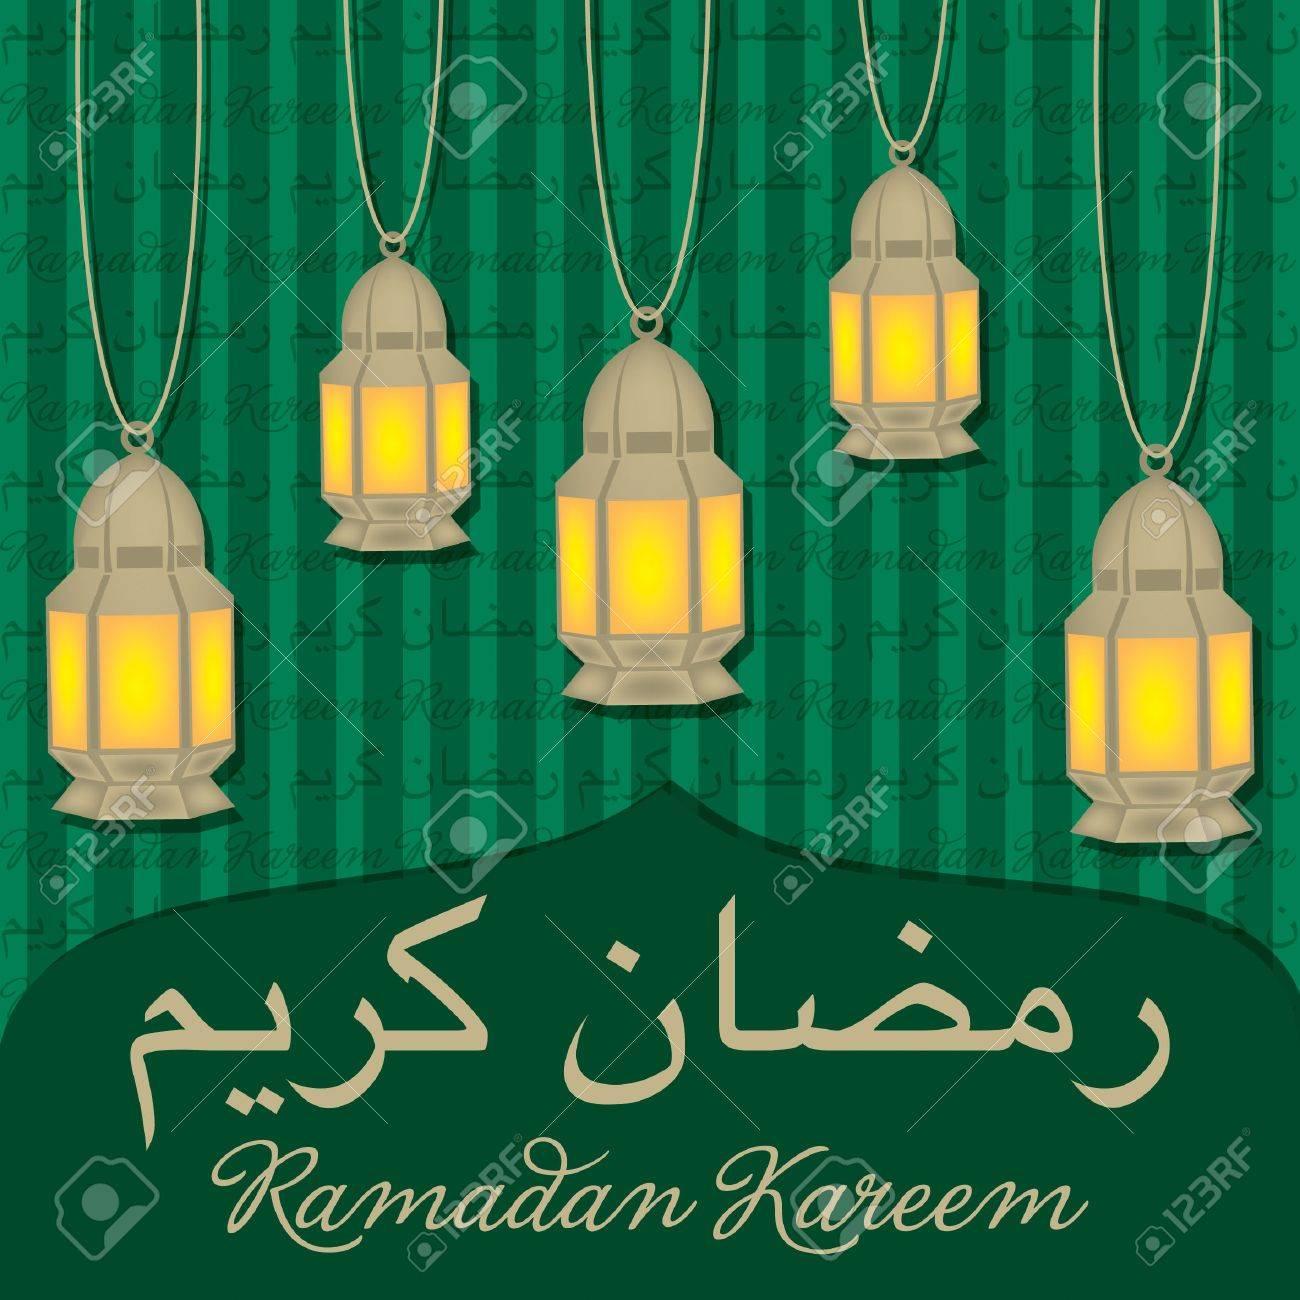 Green Ramadan greeting card Stock Vector - 19400982